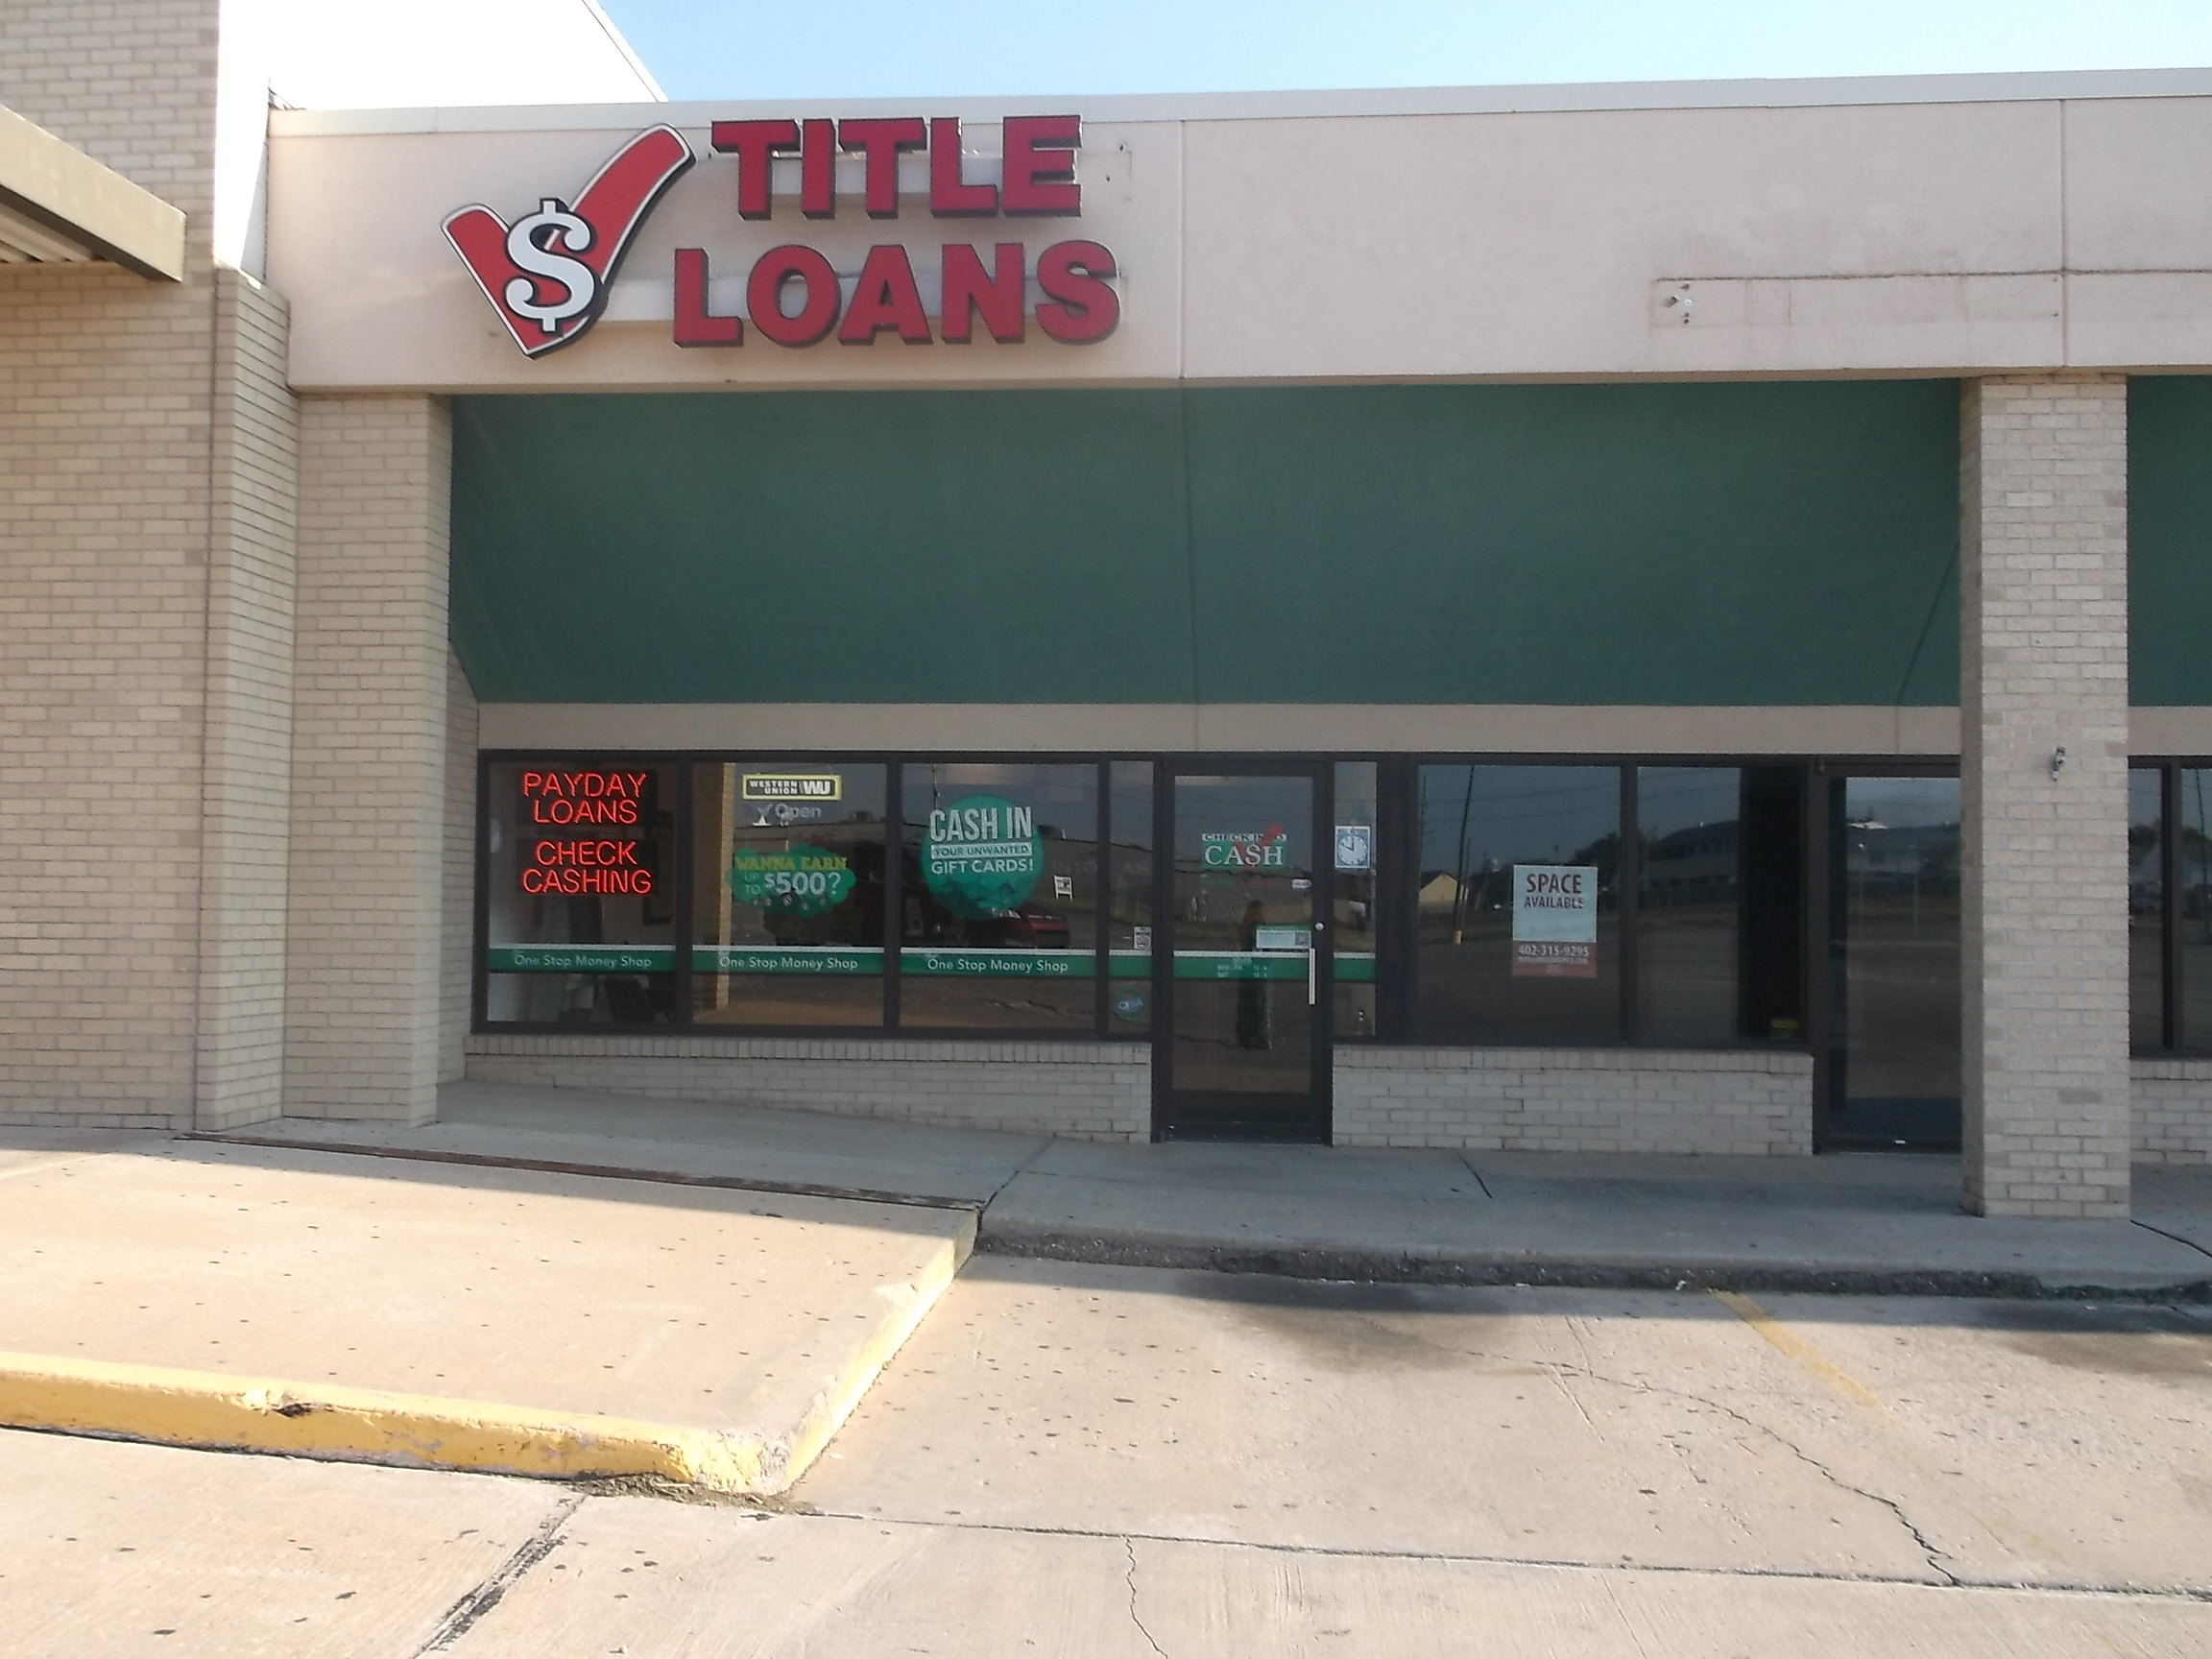 Payday loan ltd image 10